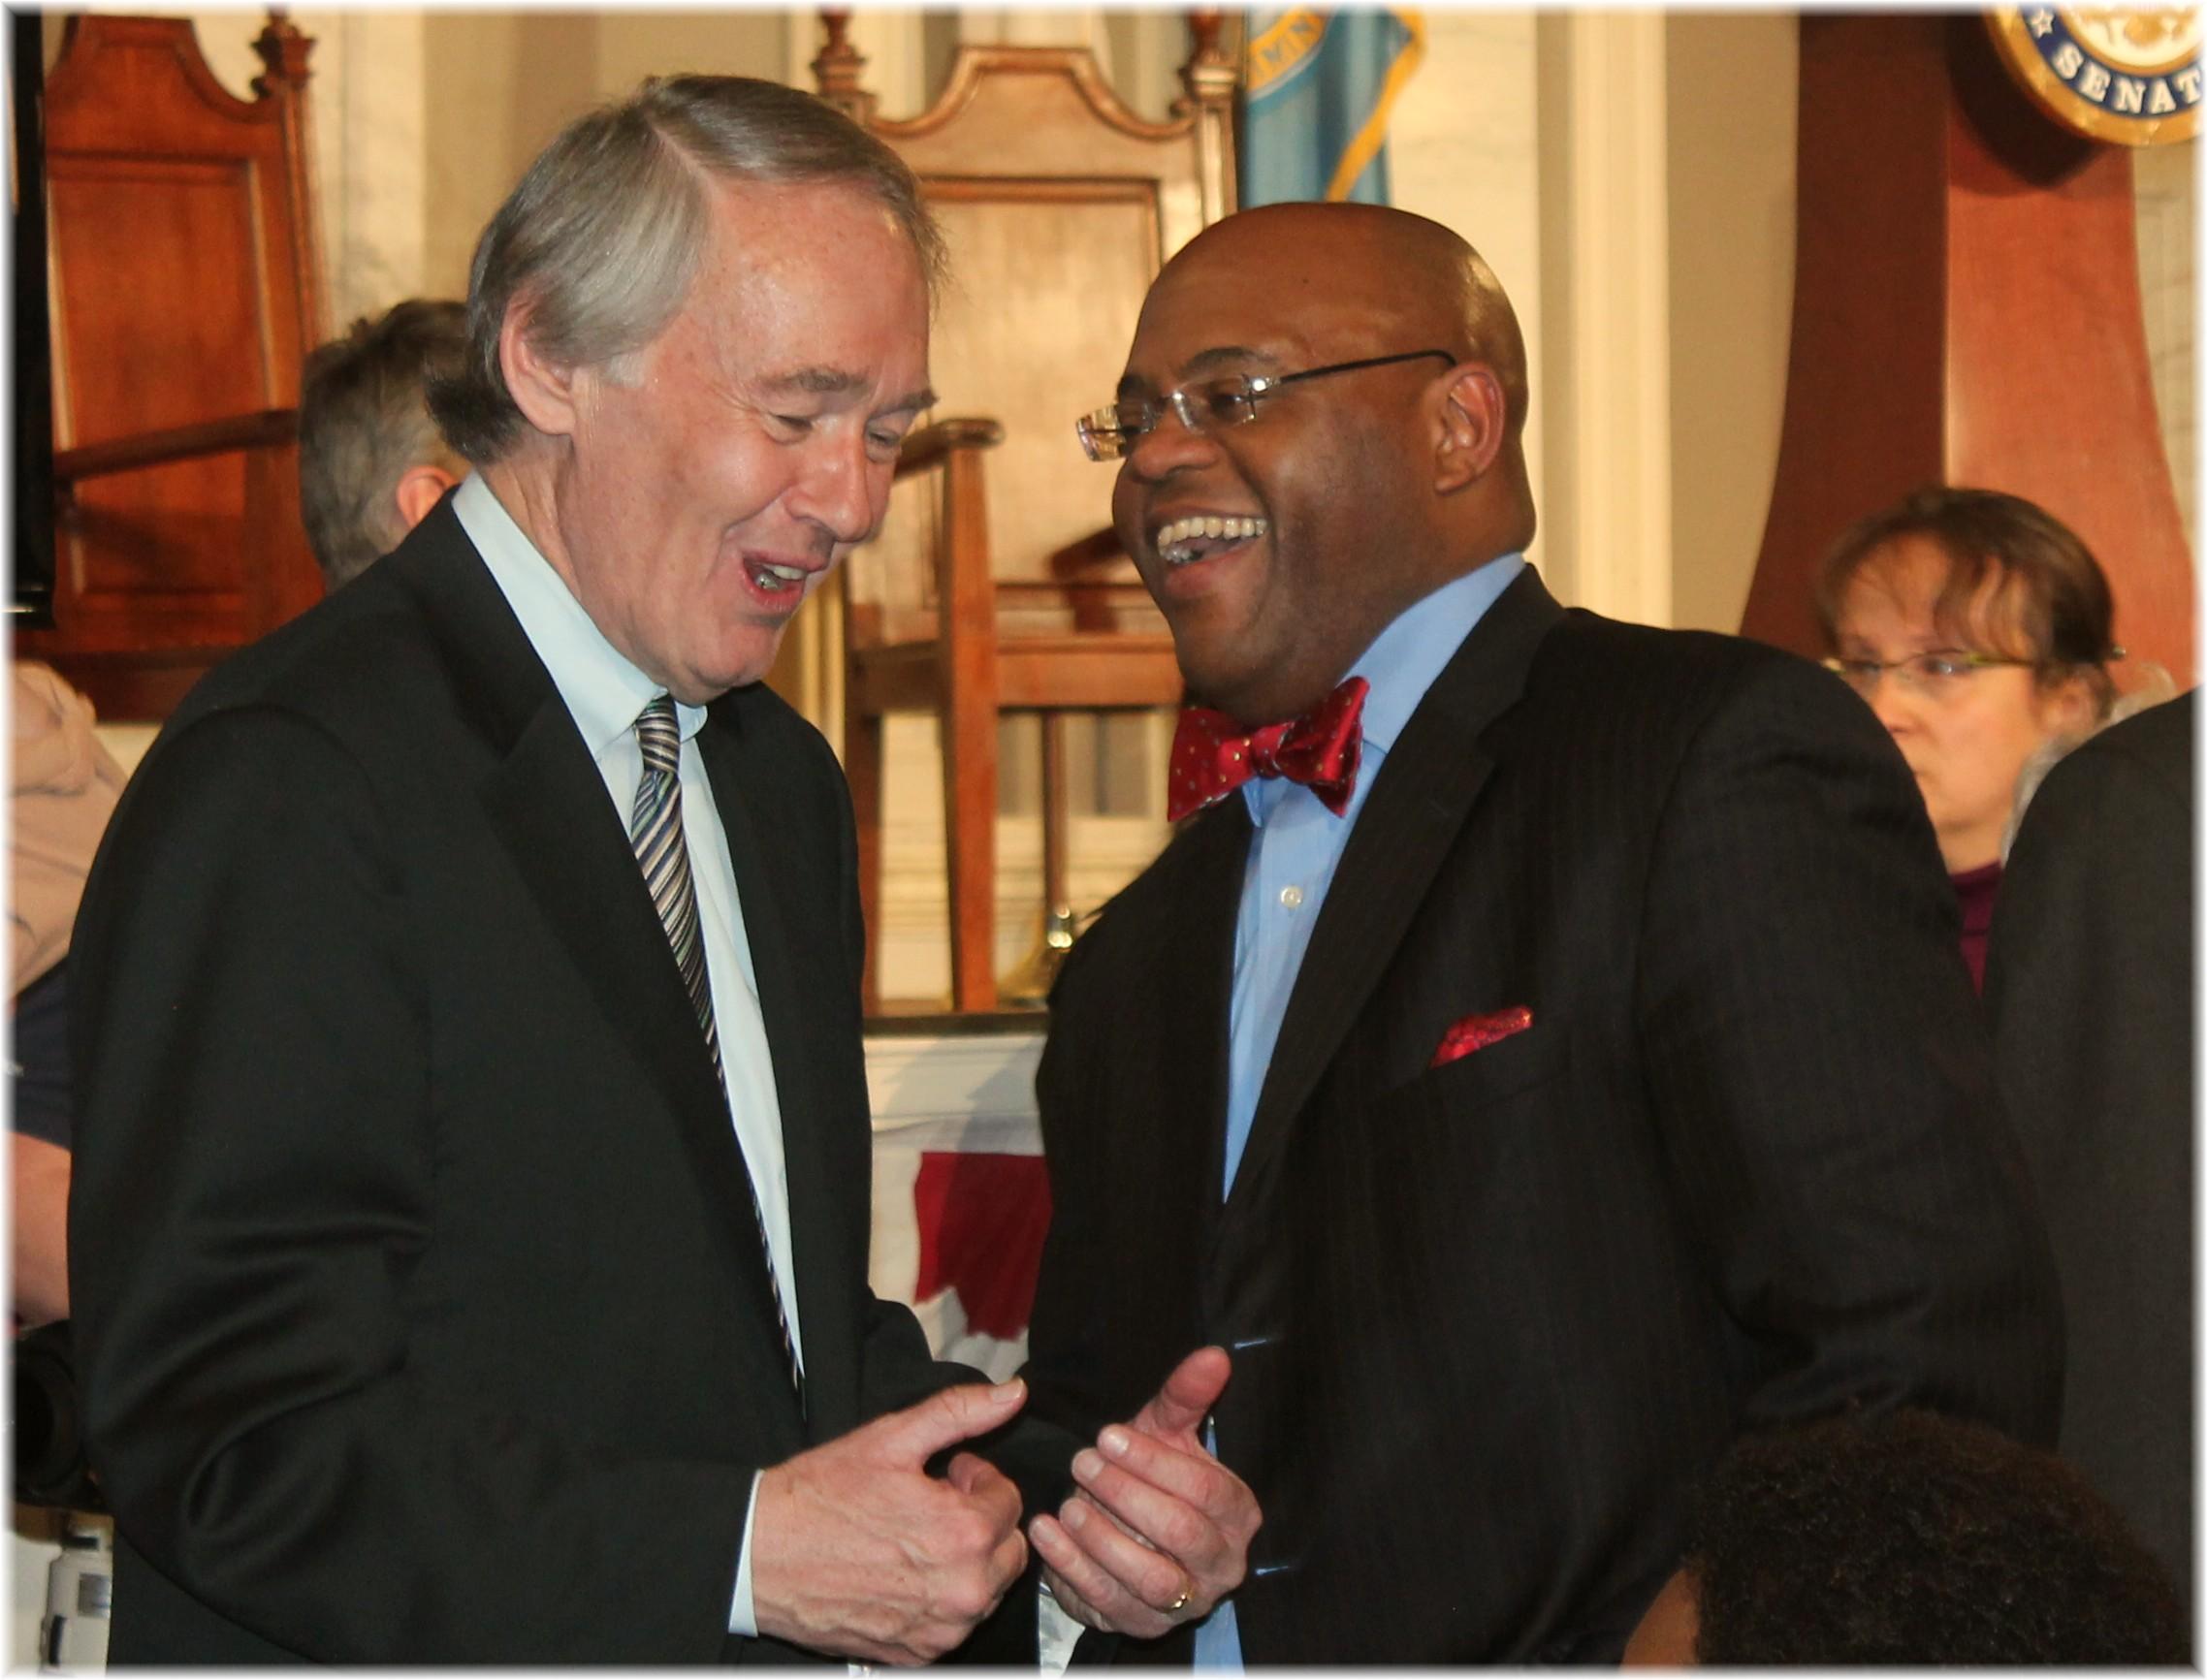 ed markey and mo cowan at john kerry farewell - 2013.jpg